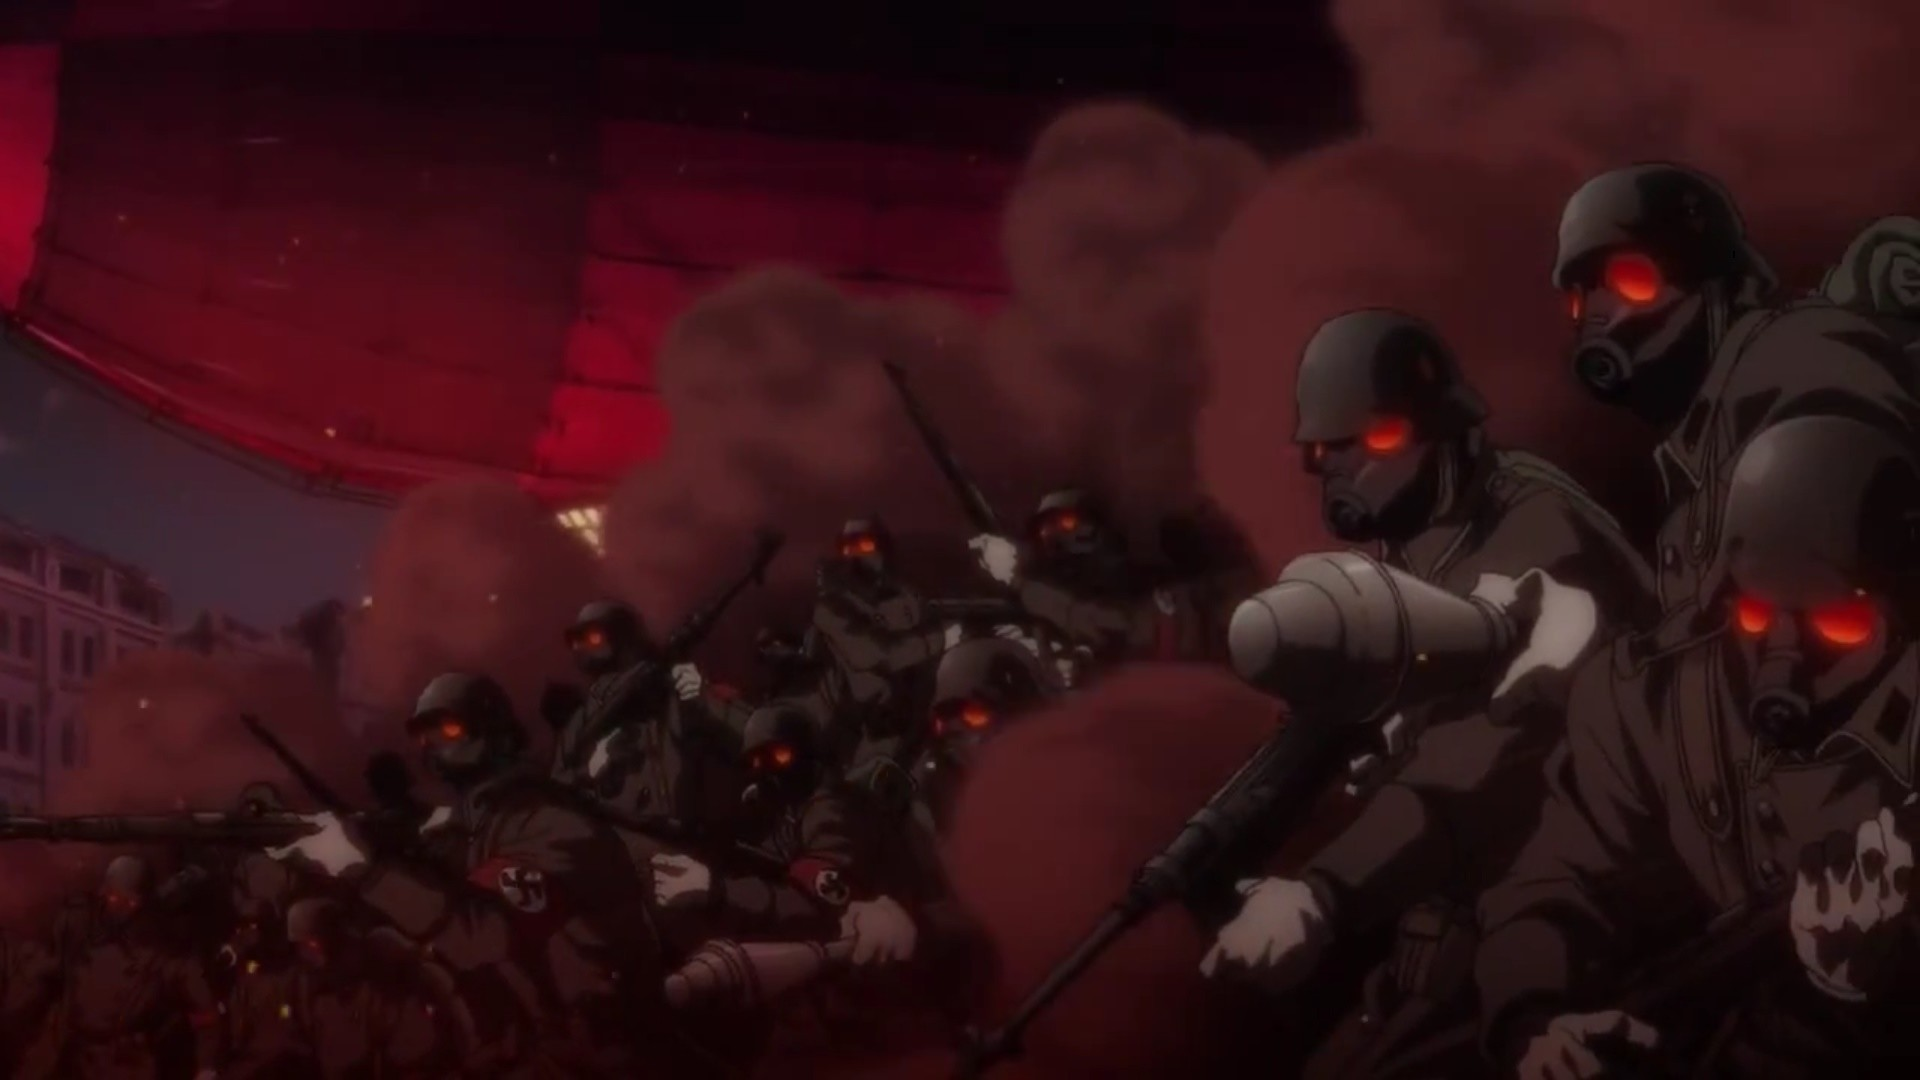 Review: Hellsing Ultimate